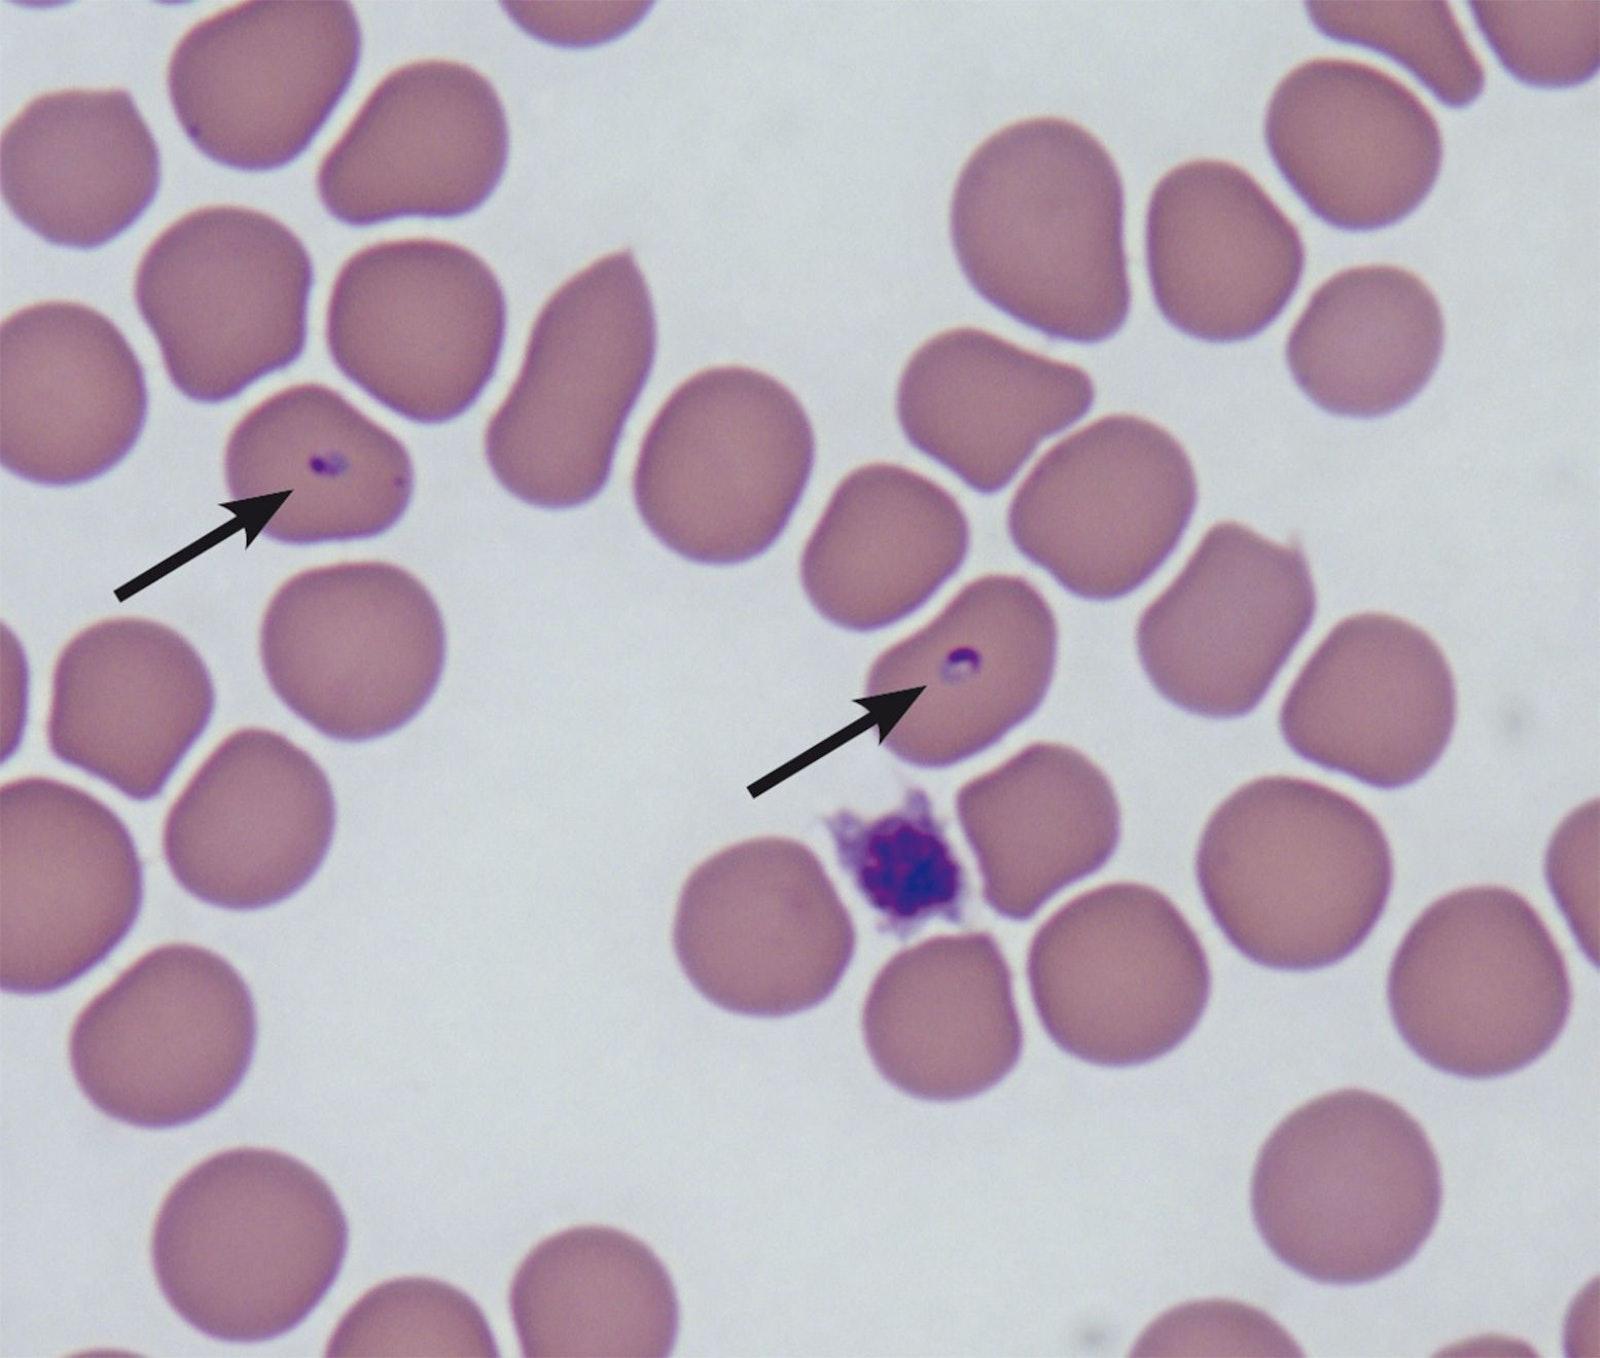 Trofozoítos intracelulares de Babesia felis (flechas)